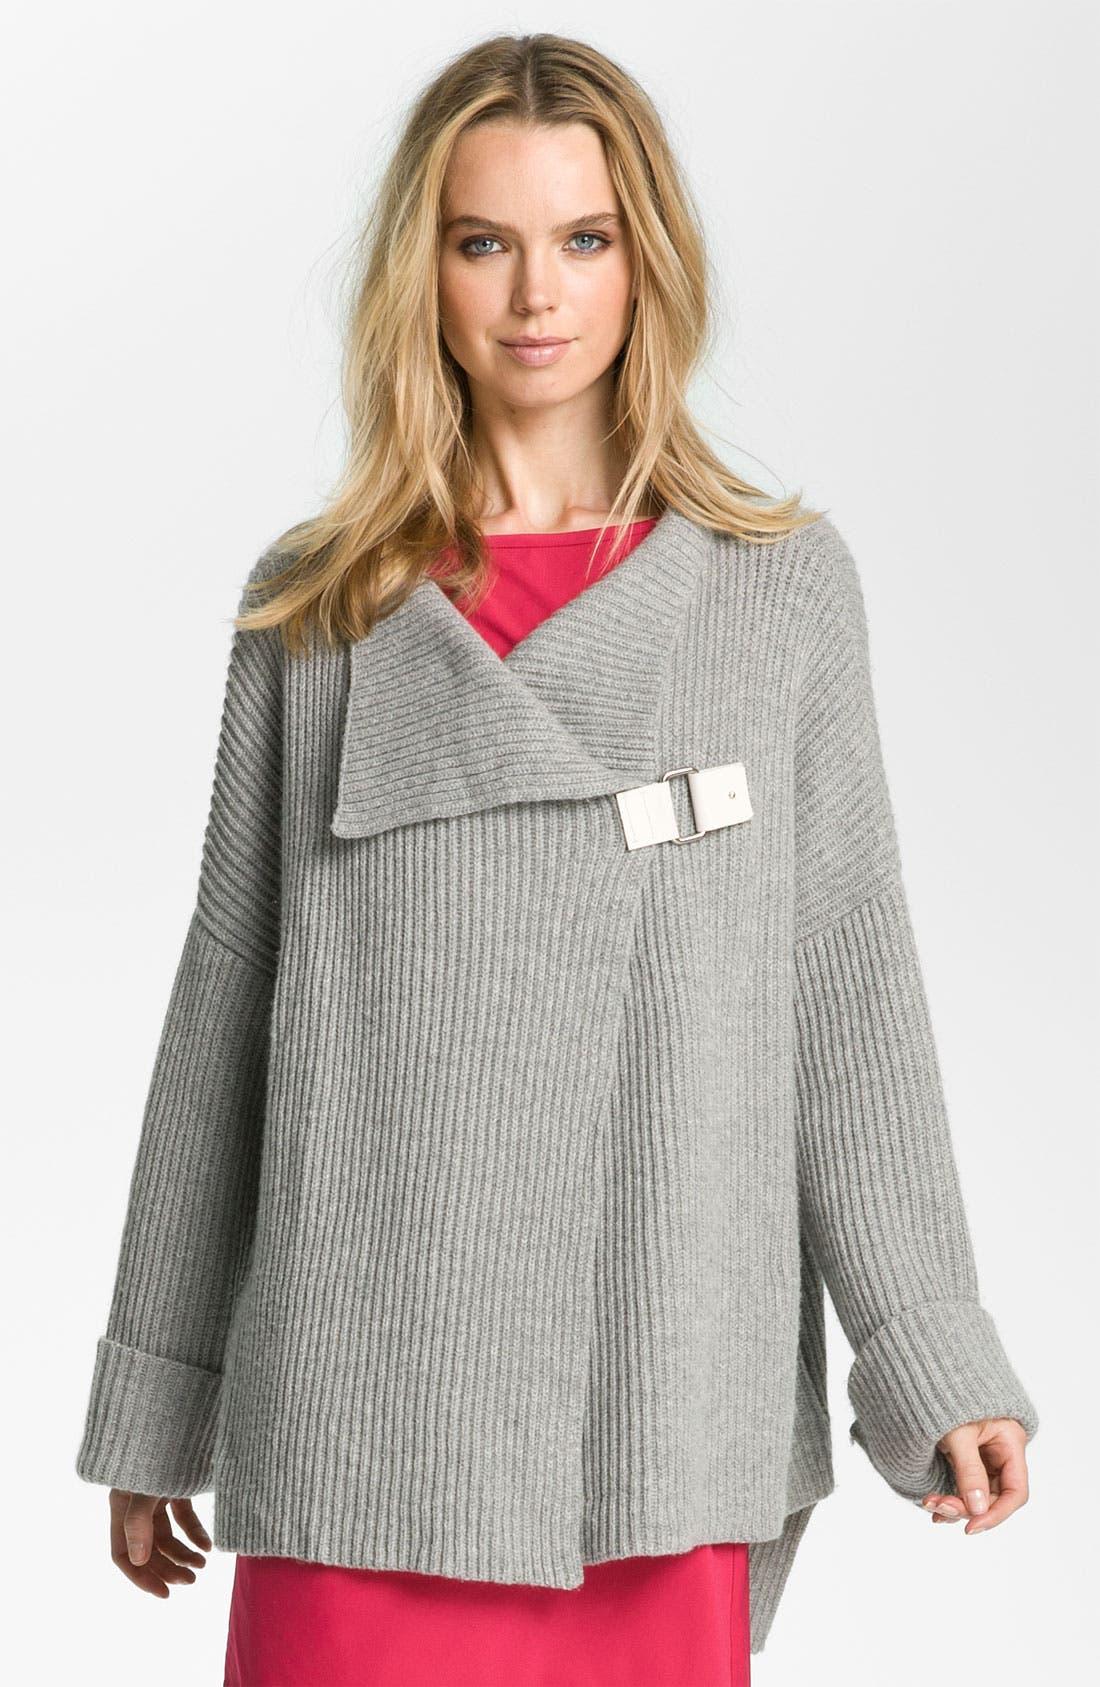 Alternate Image 1 Selected - Diane von Furstenberg 'Brooke' Wool Sweater